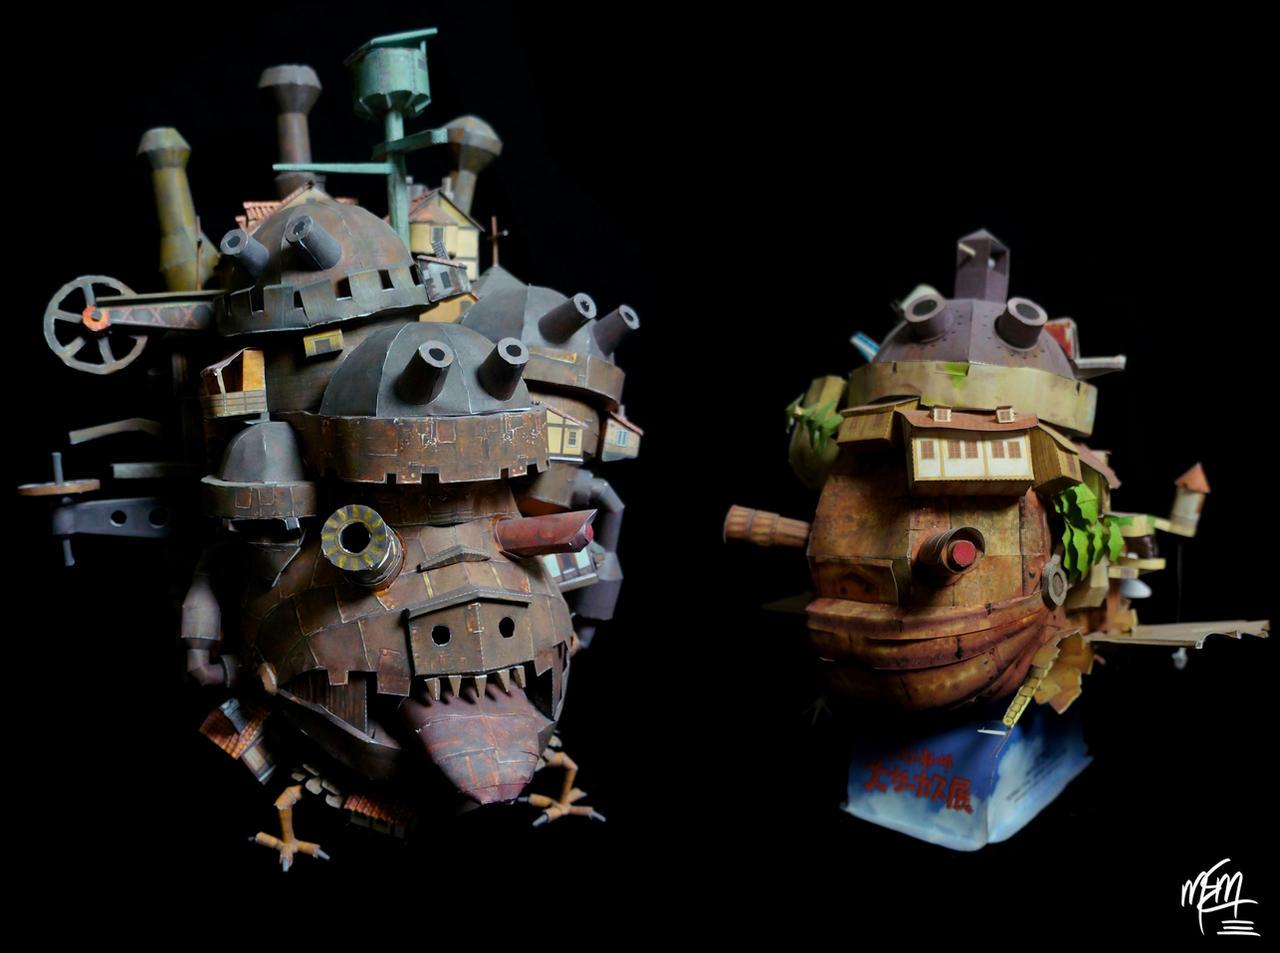 Howl's Paper Castles by studioofmm